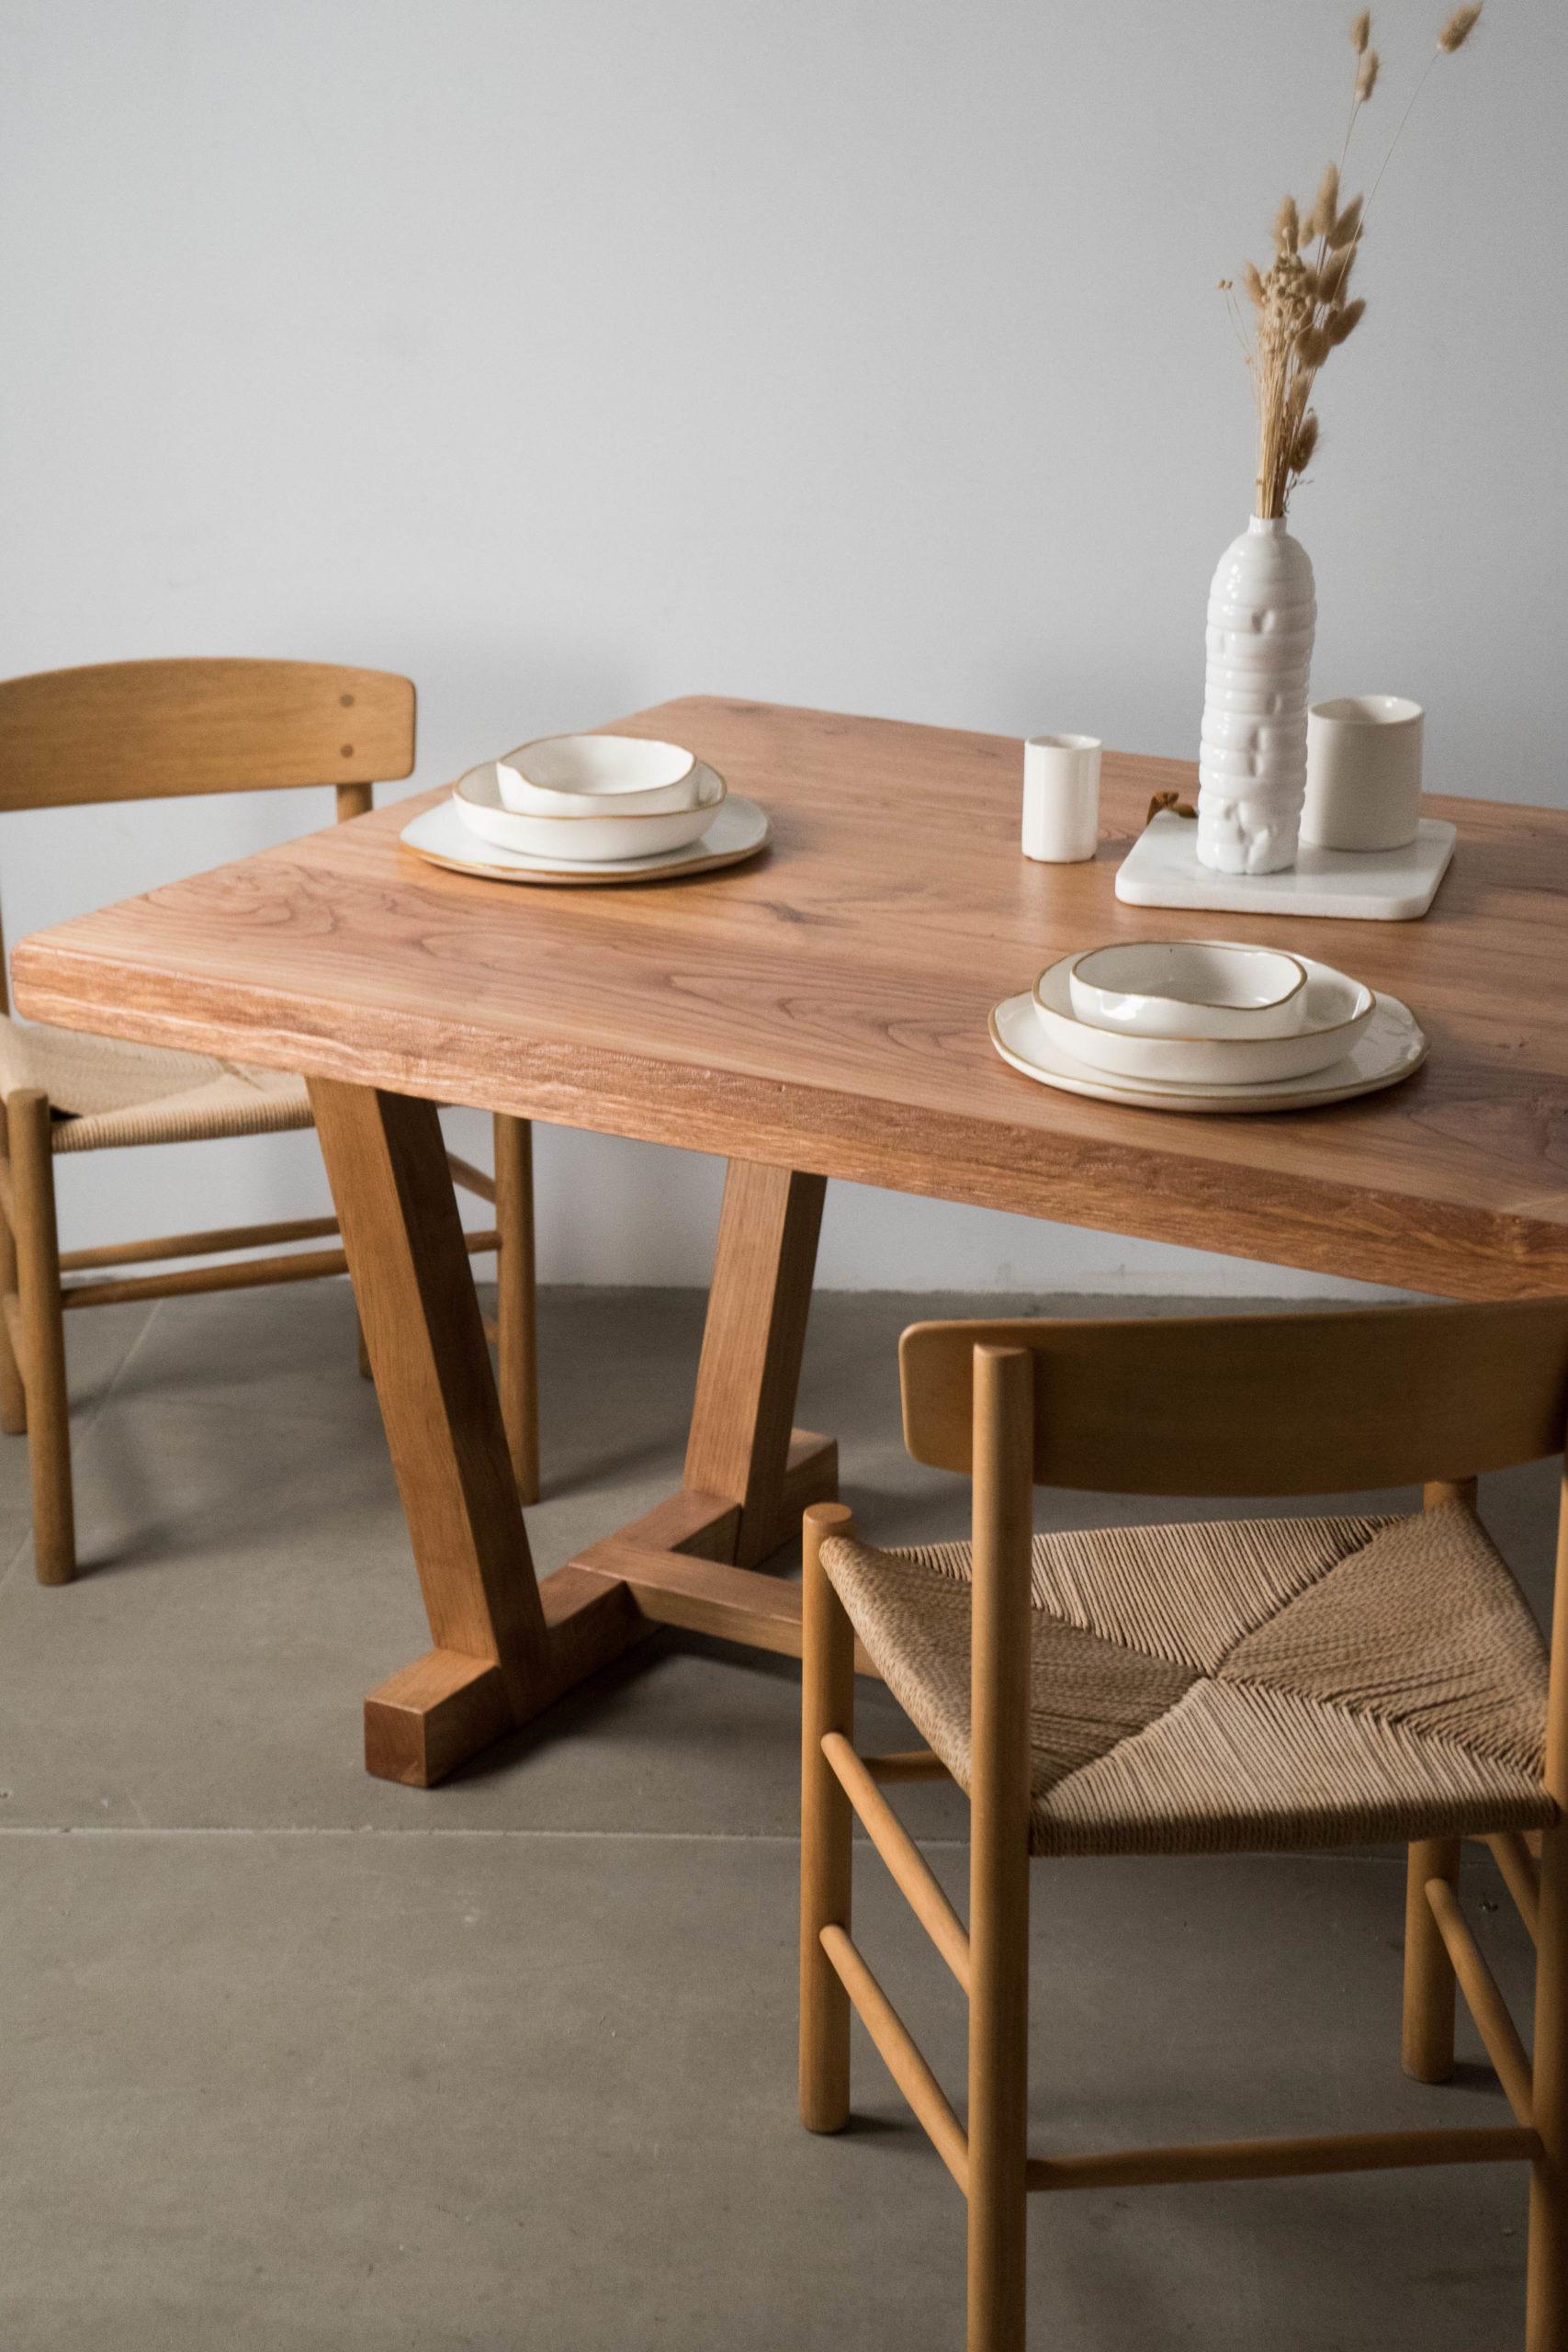 mesa de comedor rustica de madera maciza de castaño sillas j39